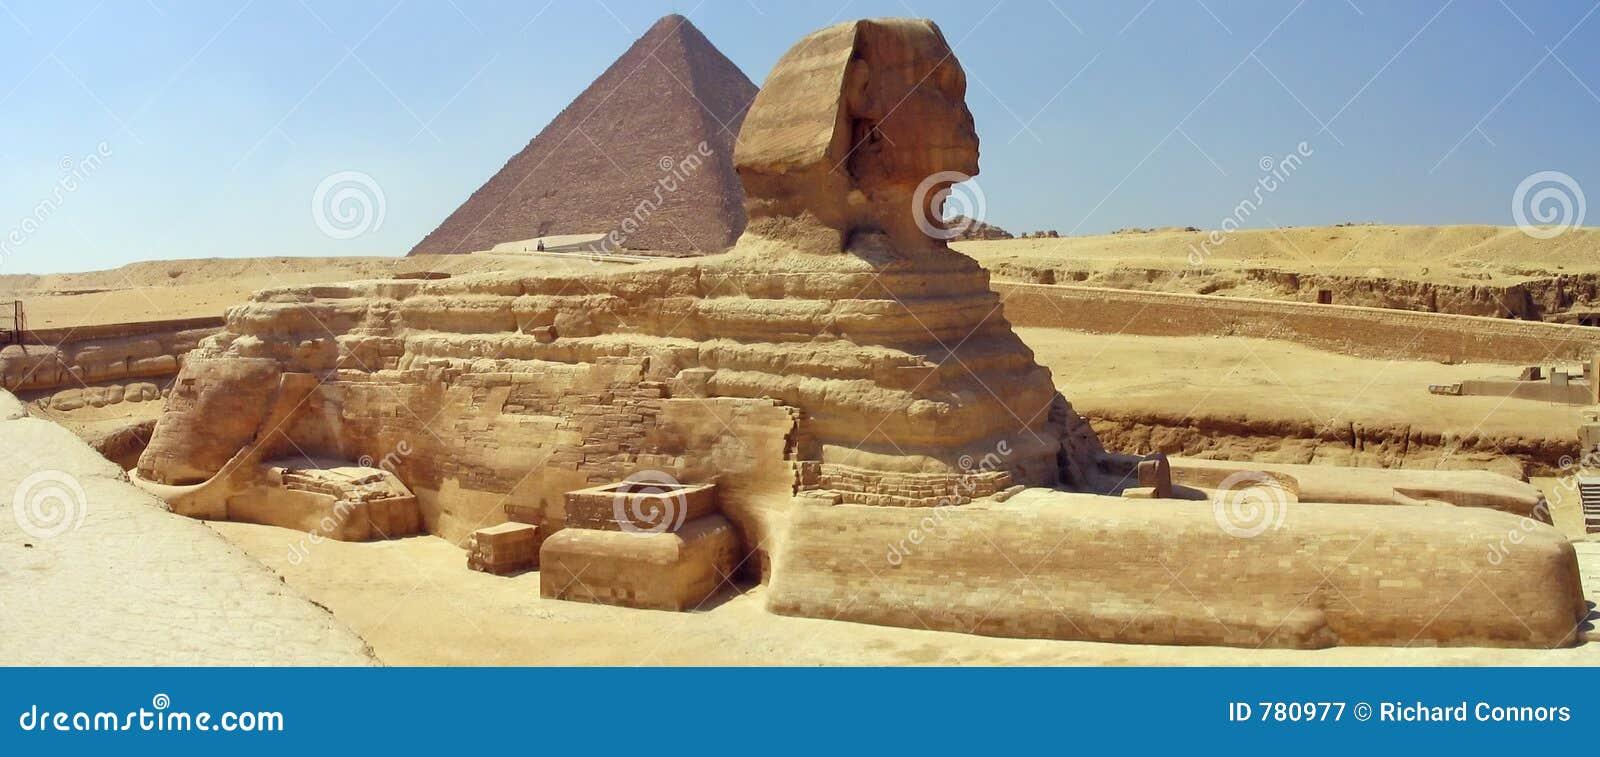 Grote Sfinx, Grote Piramide. Giza, Egypte.